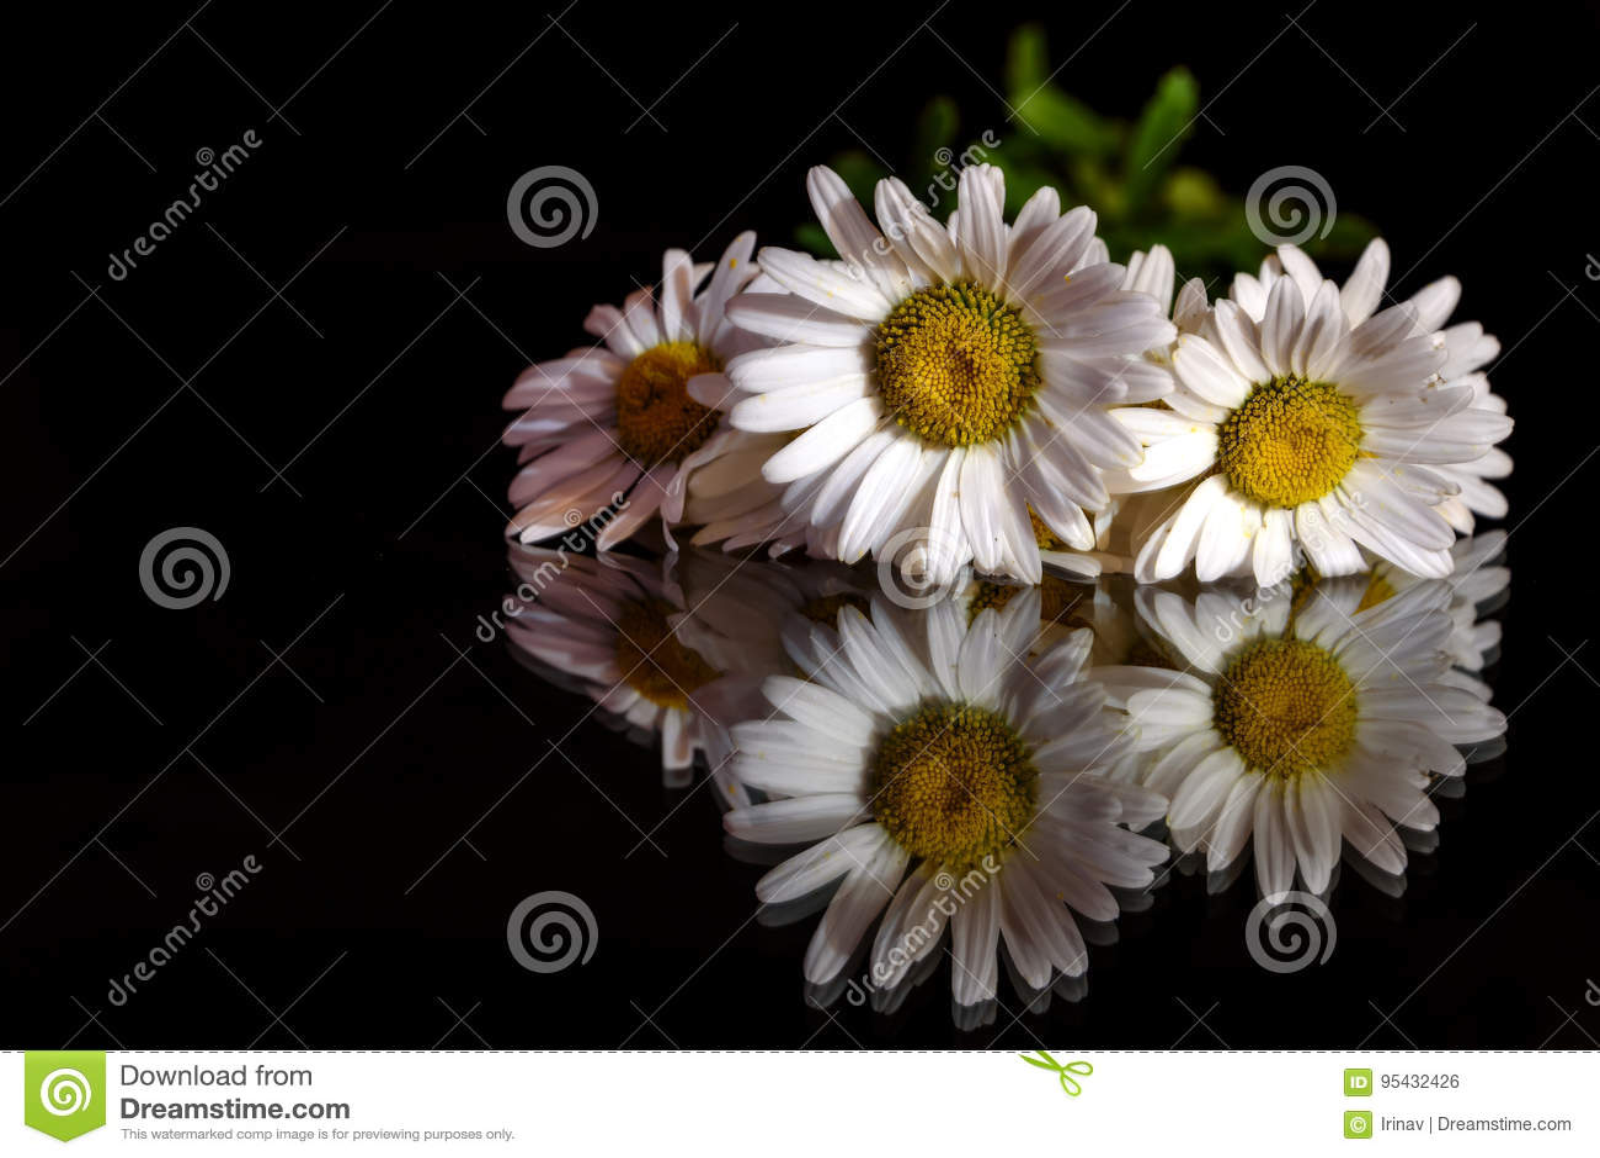 Daisy white flower black background stock photo image of glass download daisy white flower black background stock photo image of glass decoration 95432426 izmirmasajfo